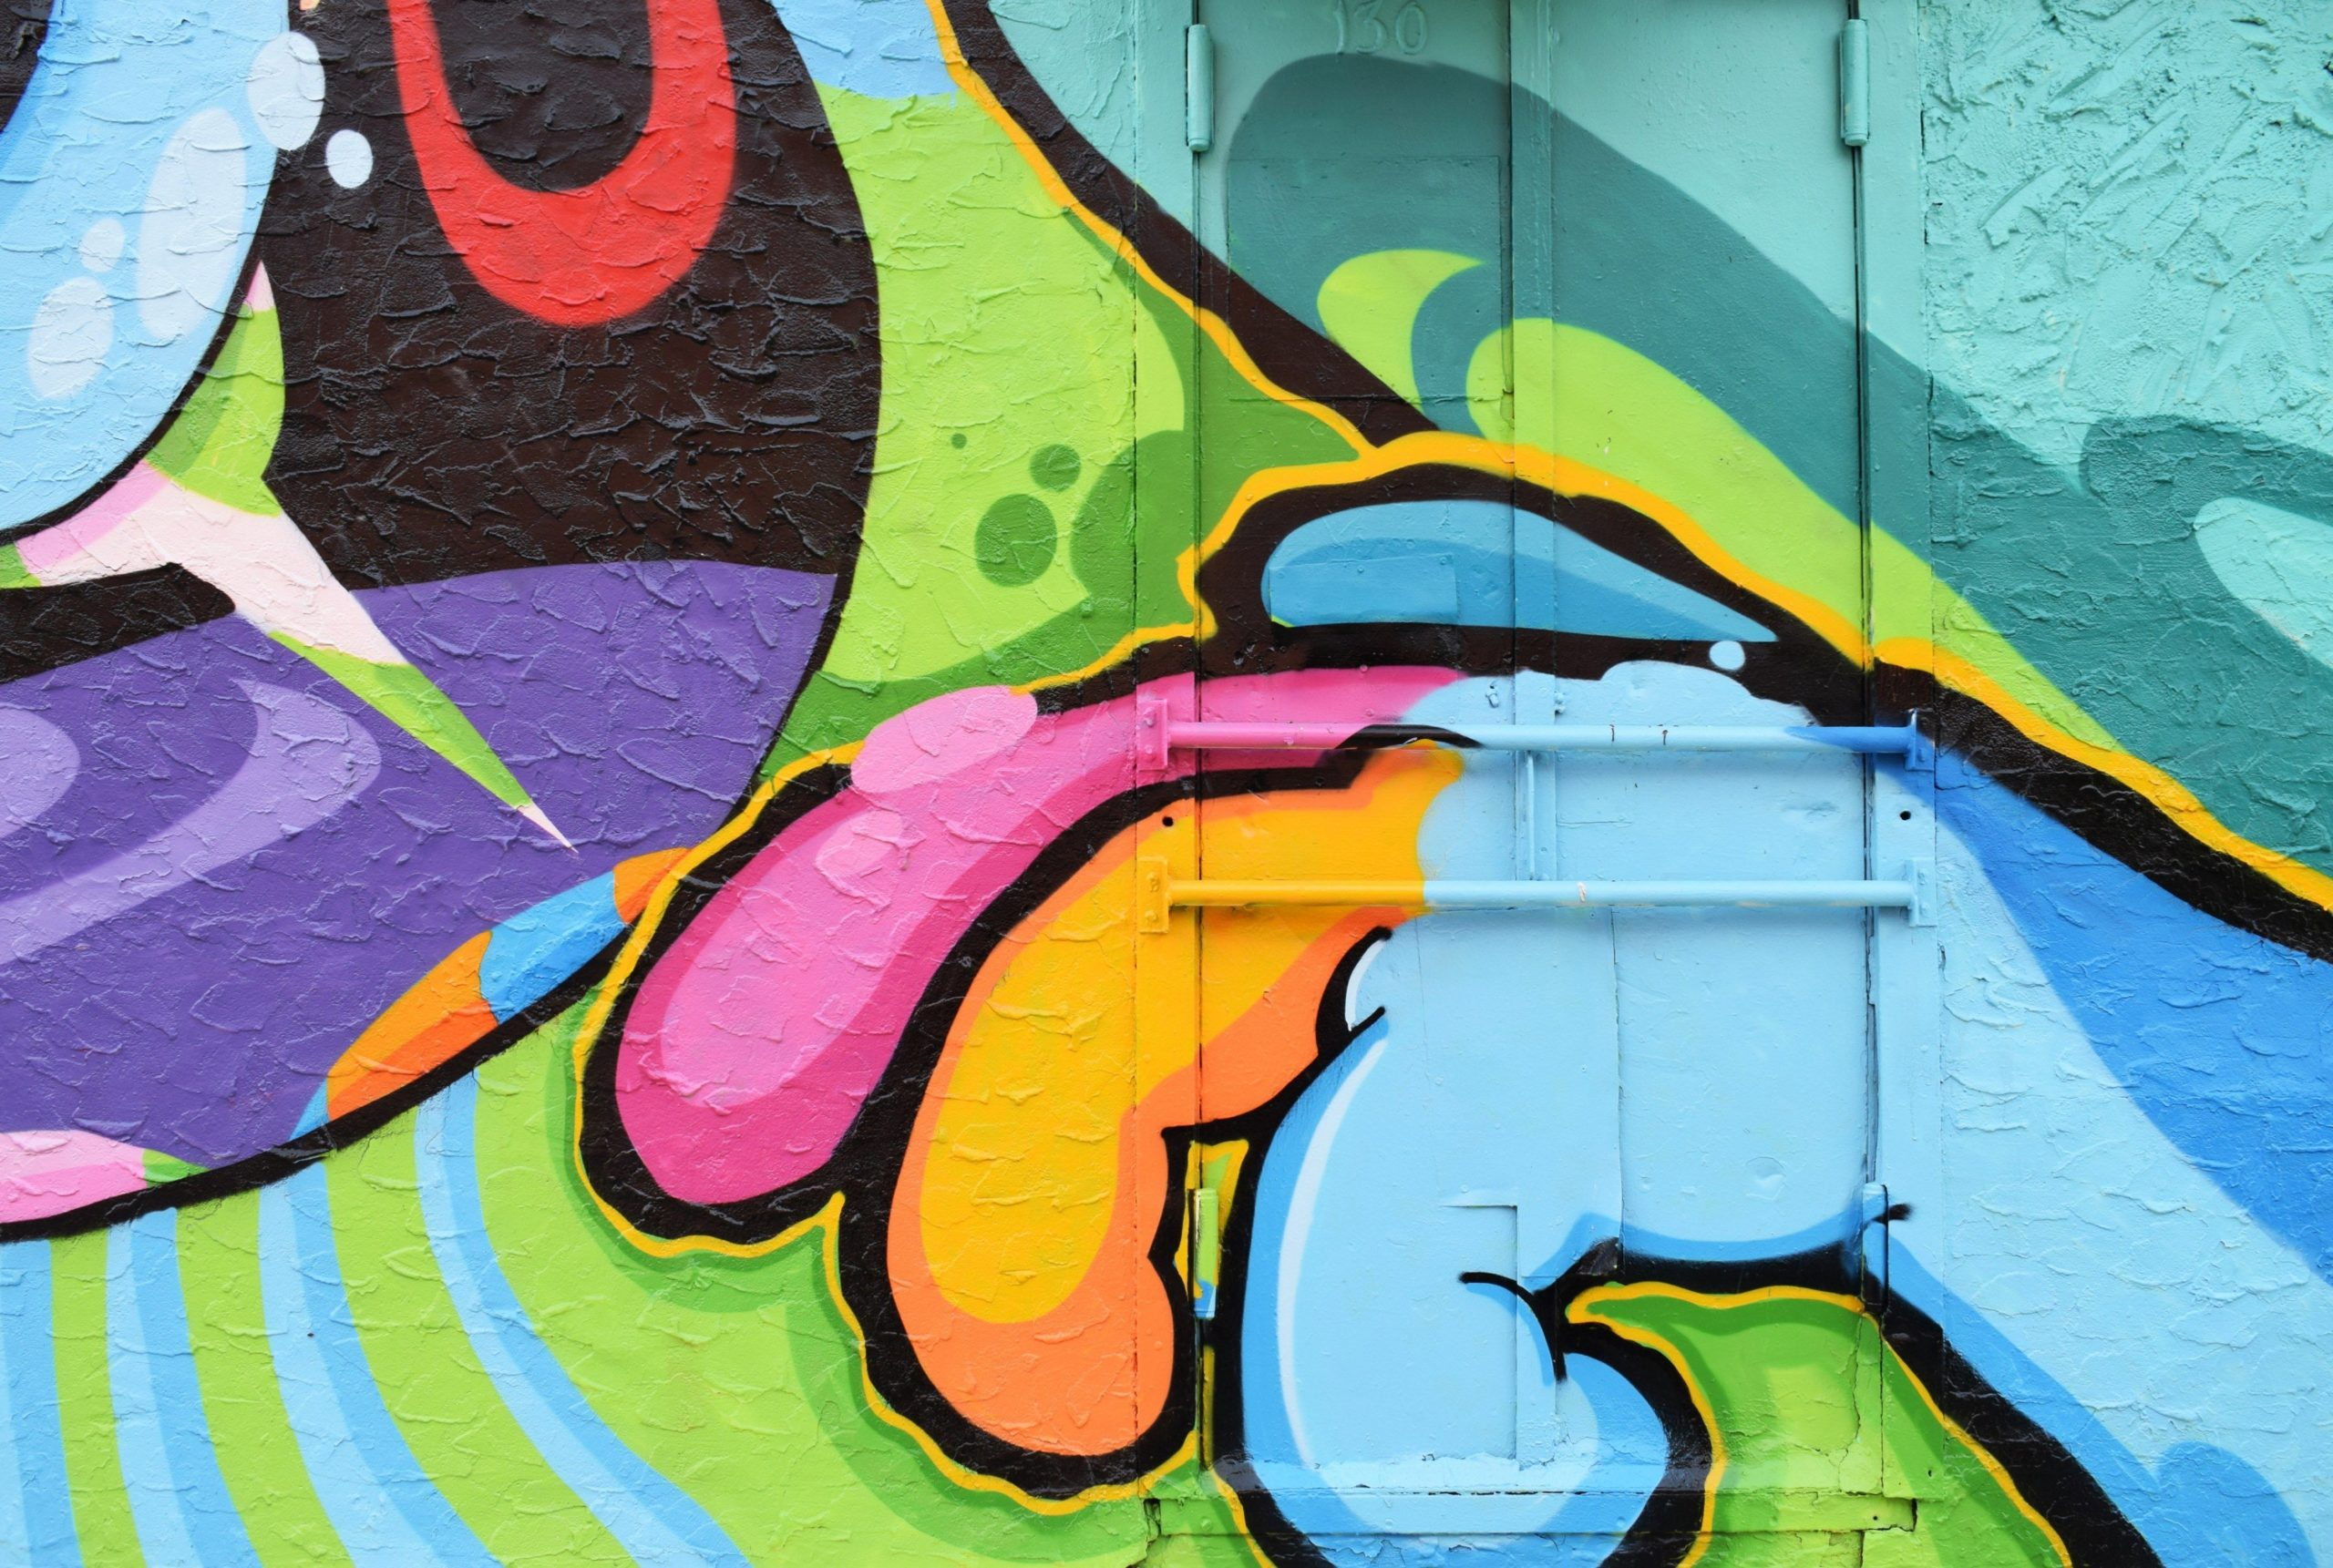 street art pictures